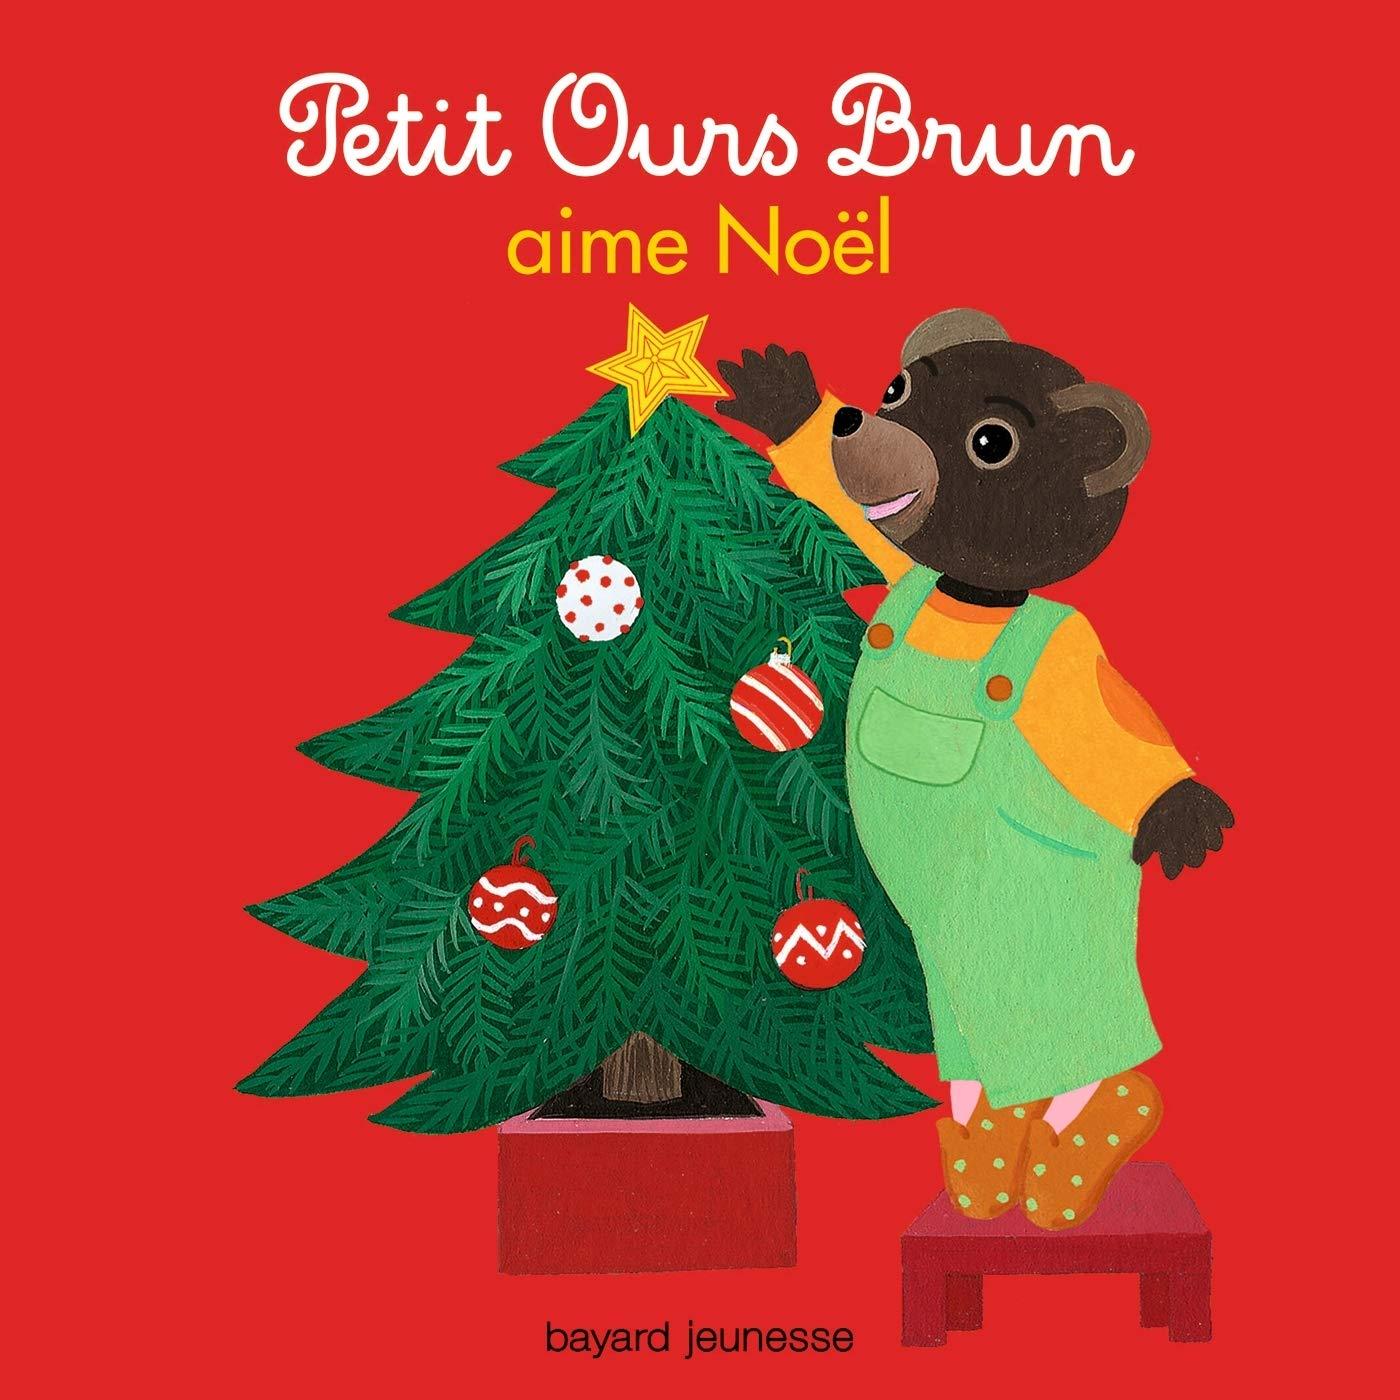 Joyeux Noel Petit Ours Brun.Petit Ours Brun Sapin De Noel Noel En France